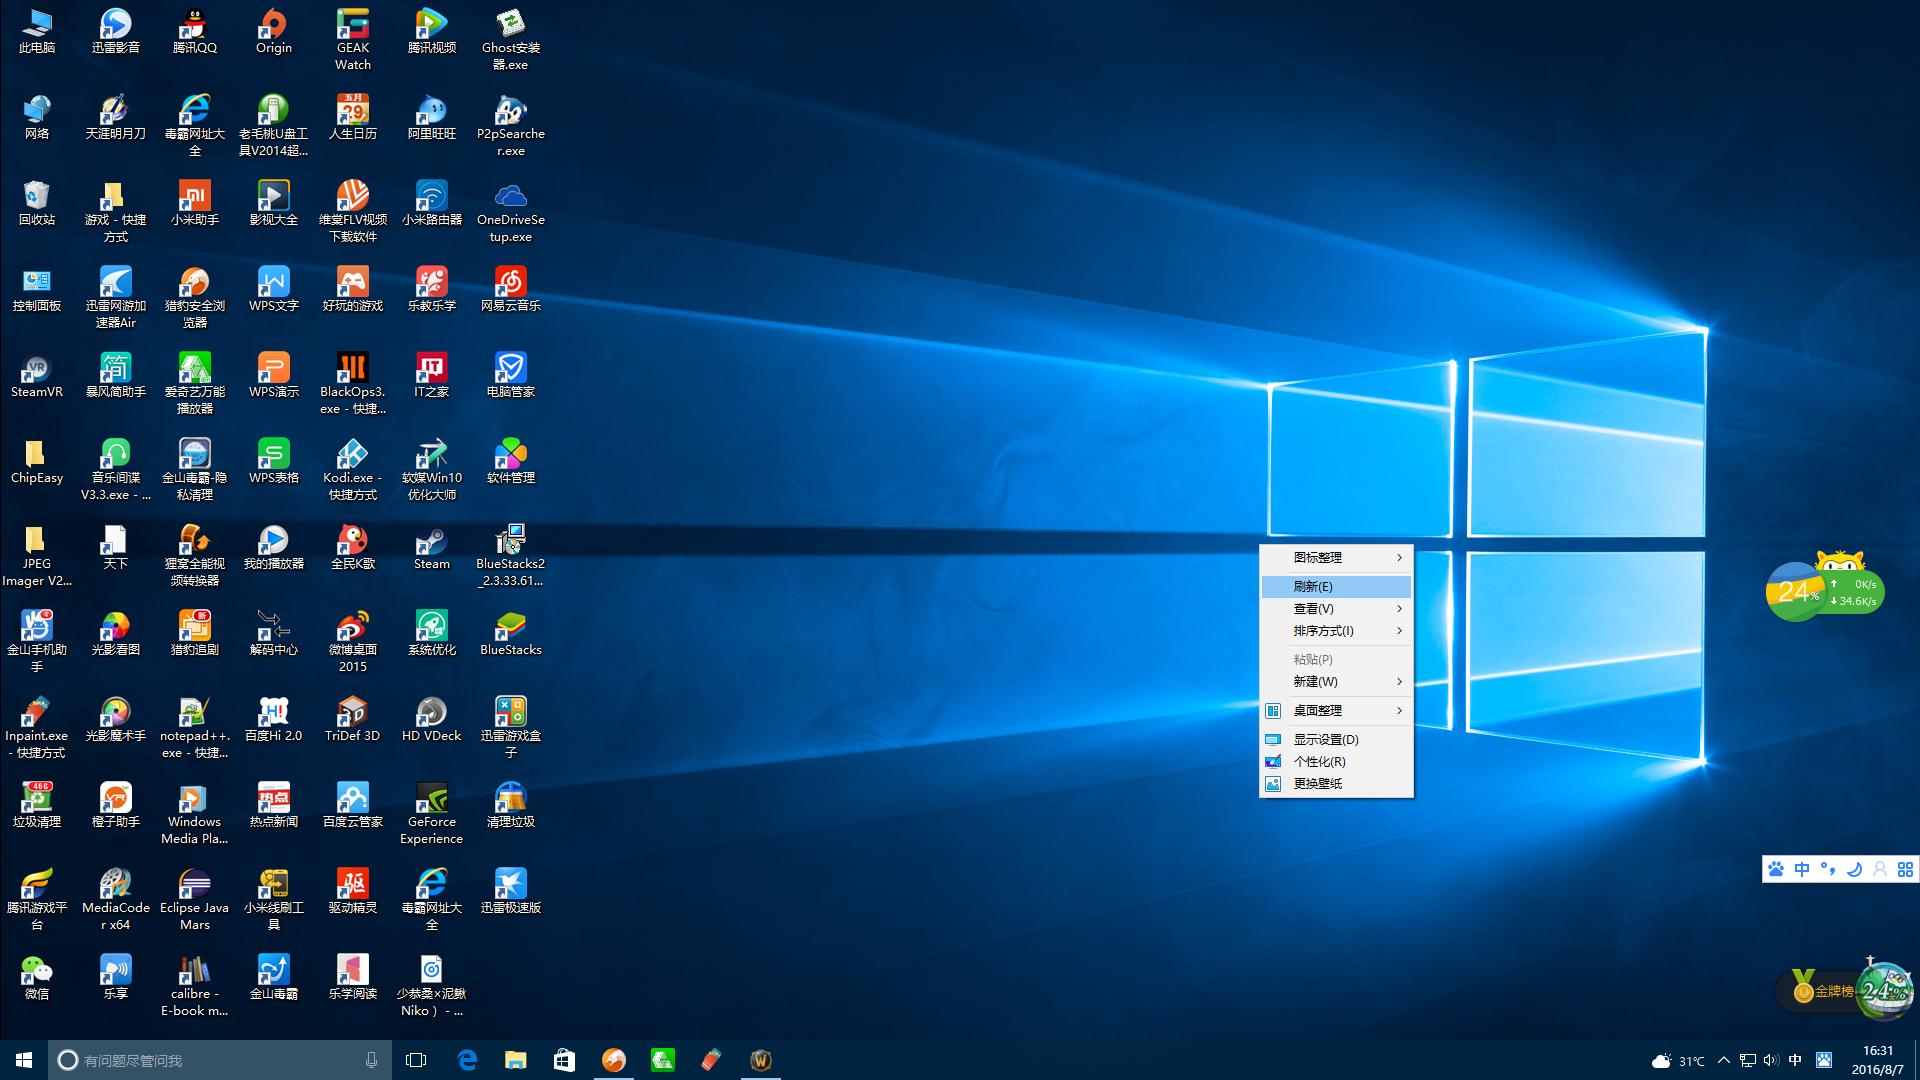 win10怎么显示我的电脑在桌面,桌面图标设置图片